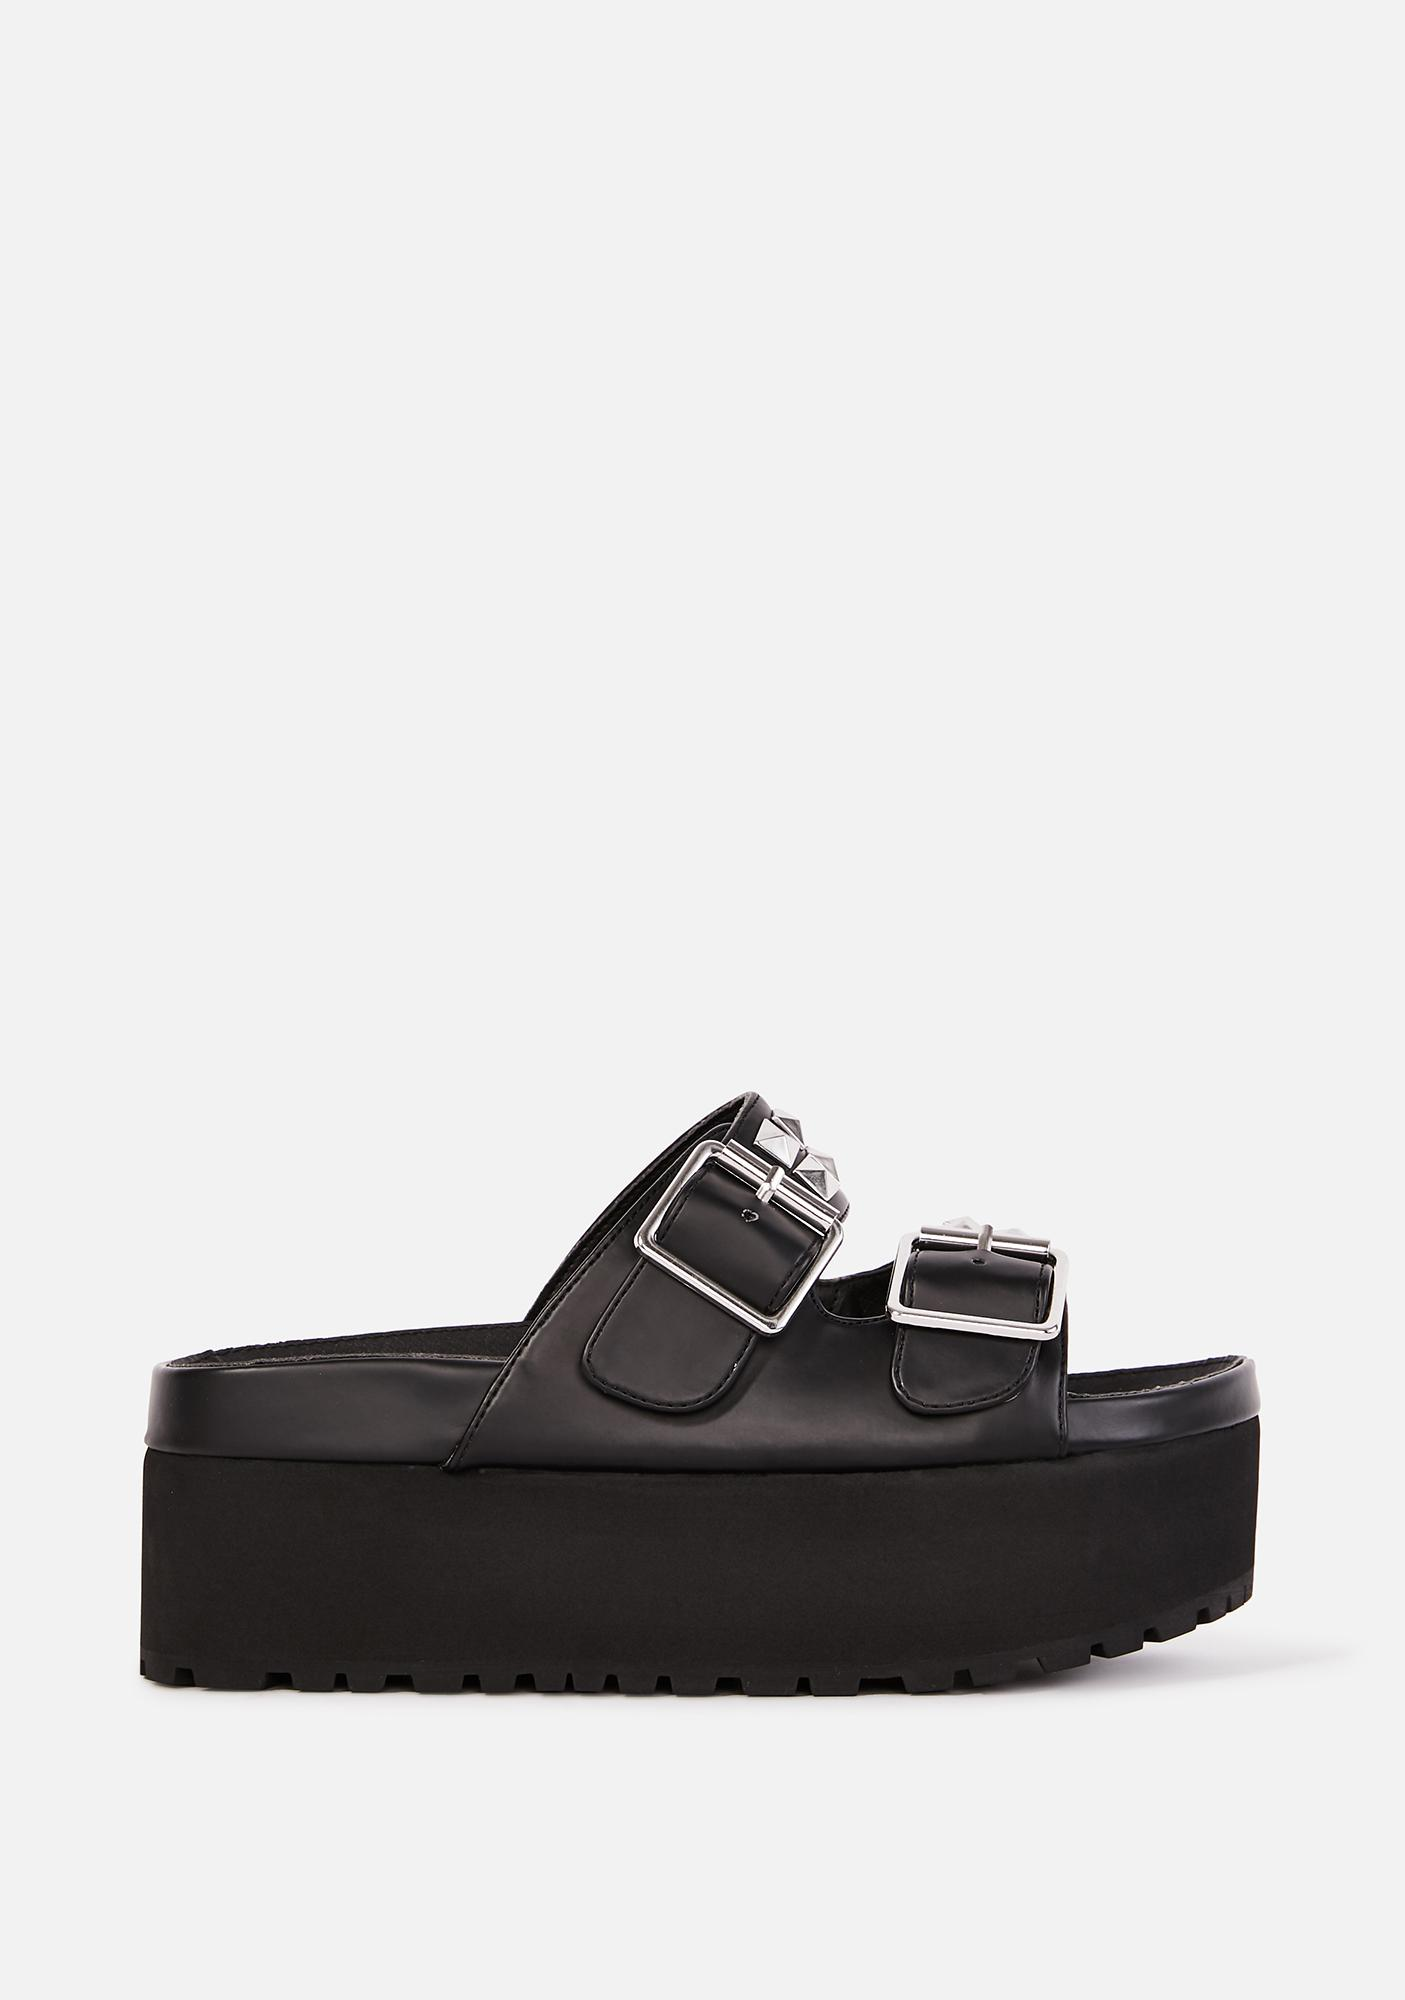 Charla Tedrick Icon Platform Sandals